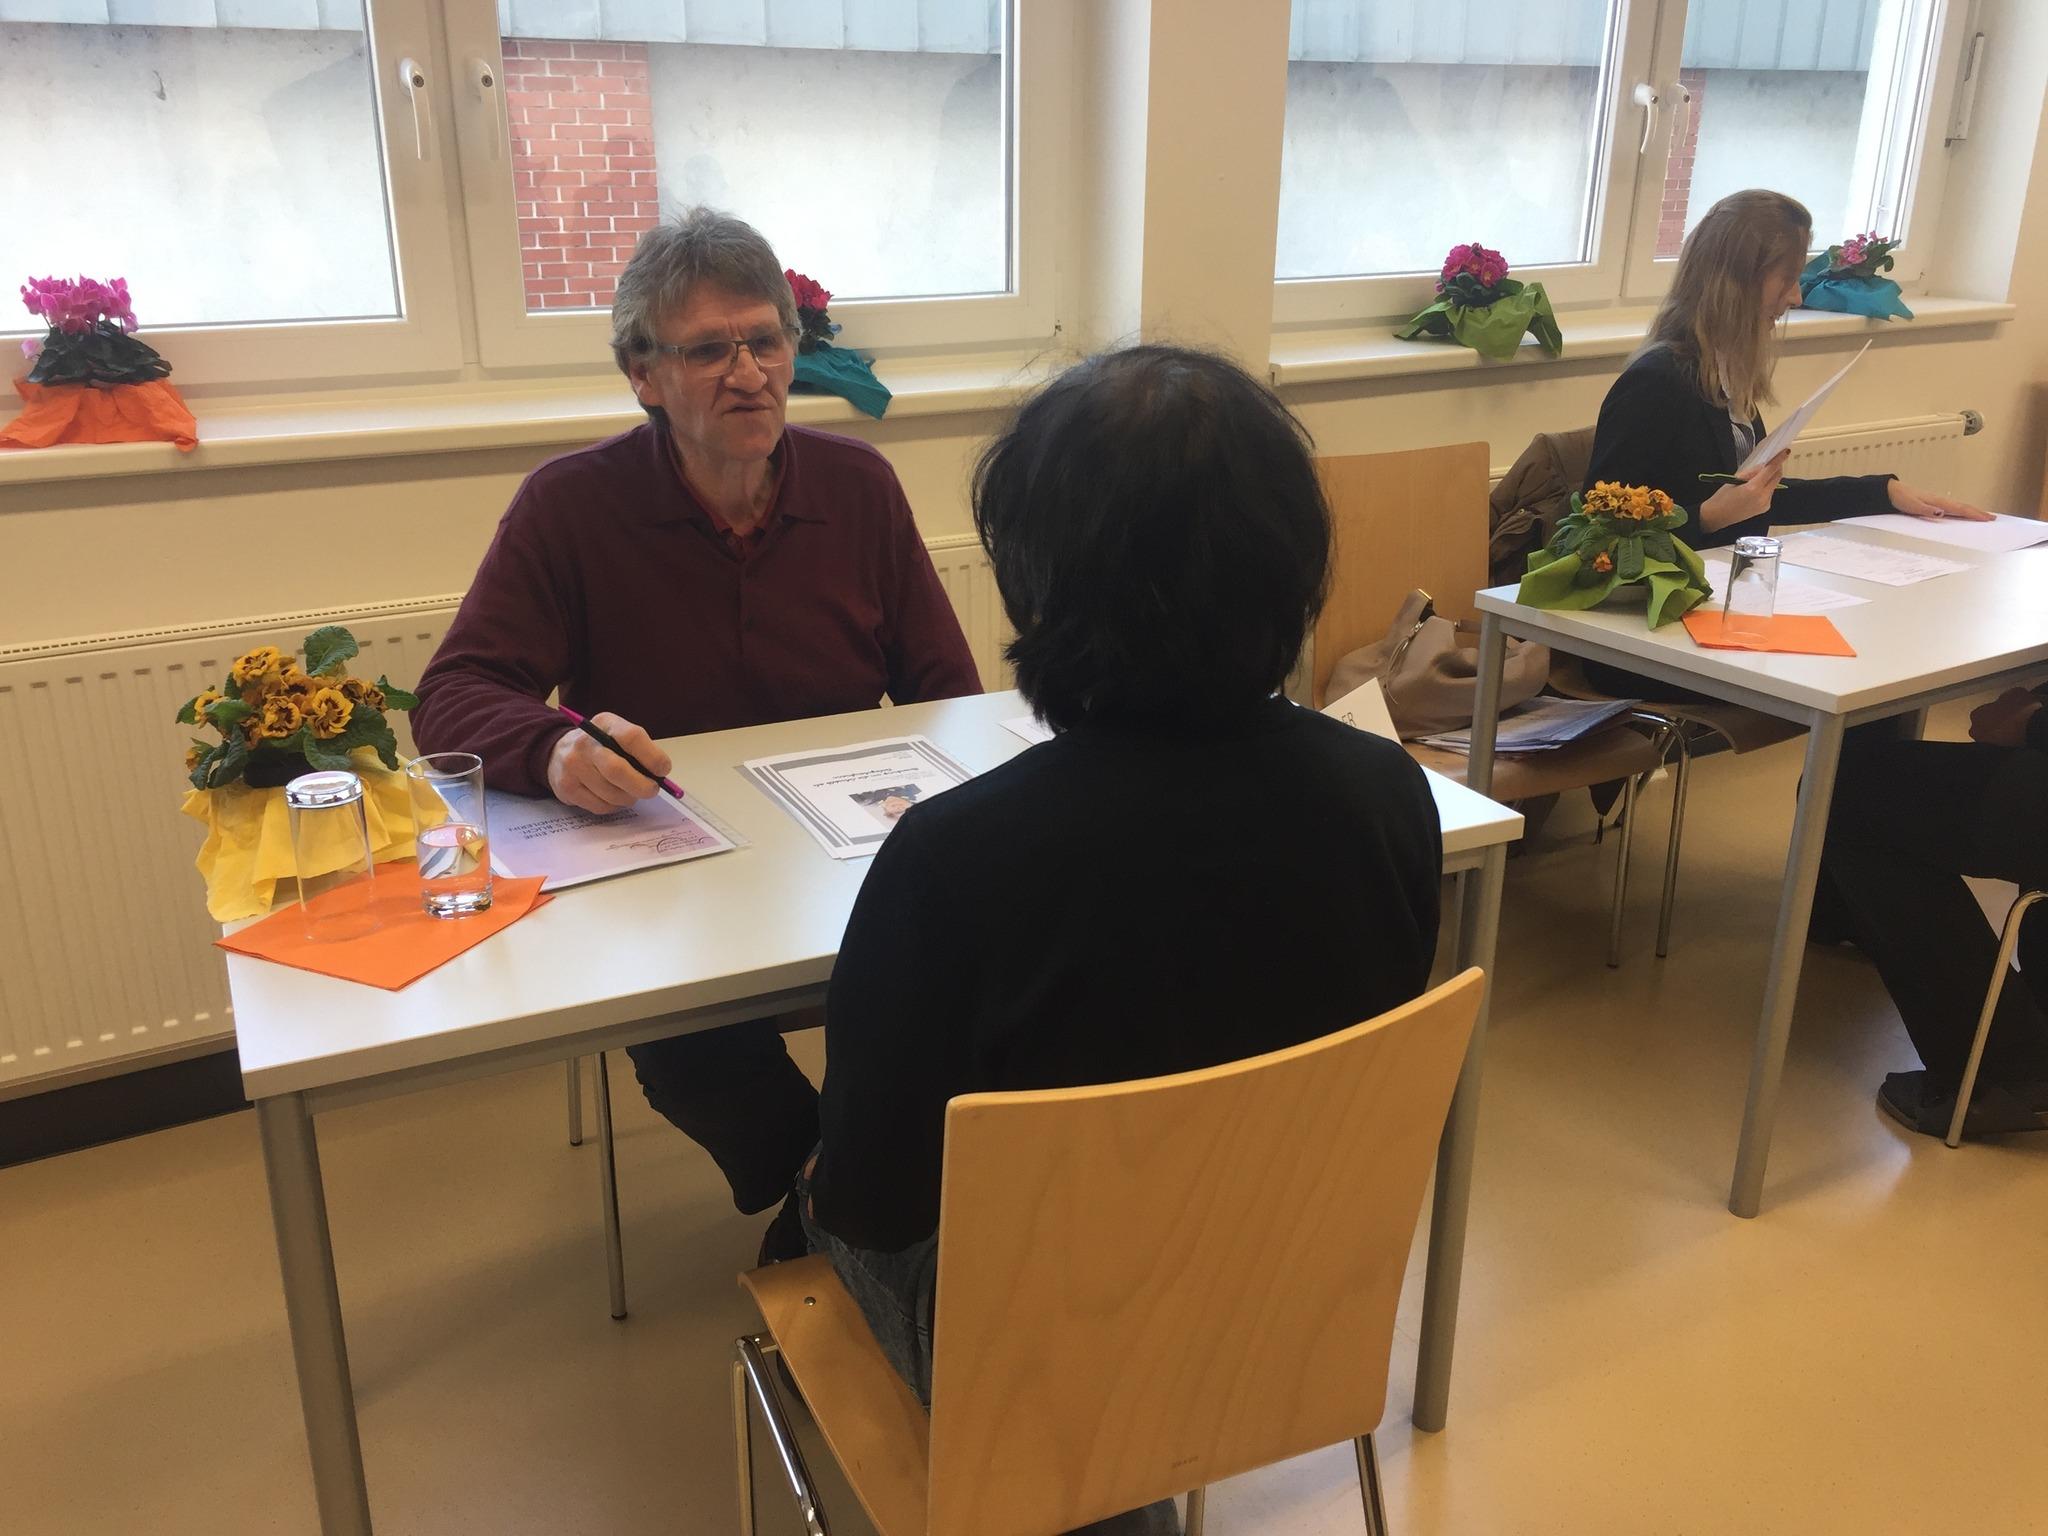 Frau single in bruck an der leitha - Trumau dating service